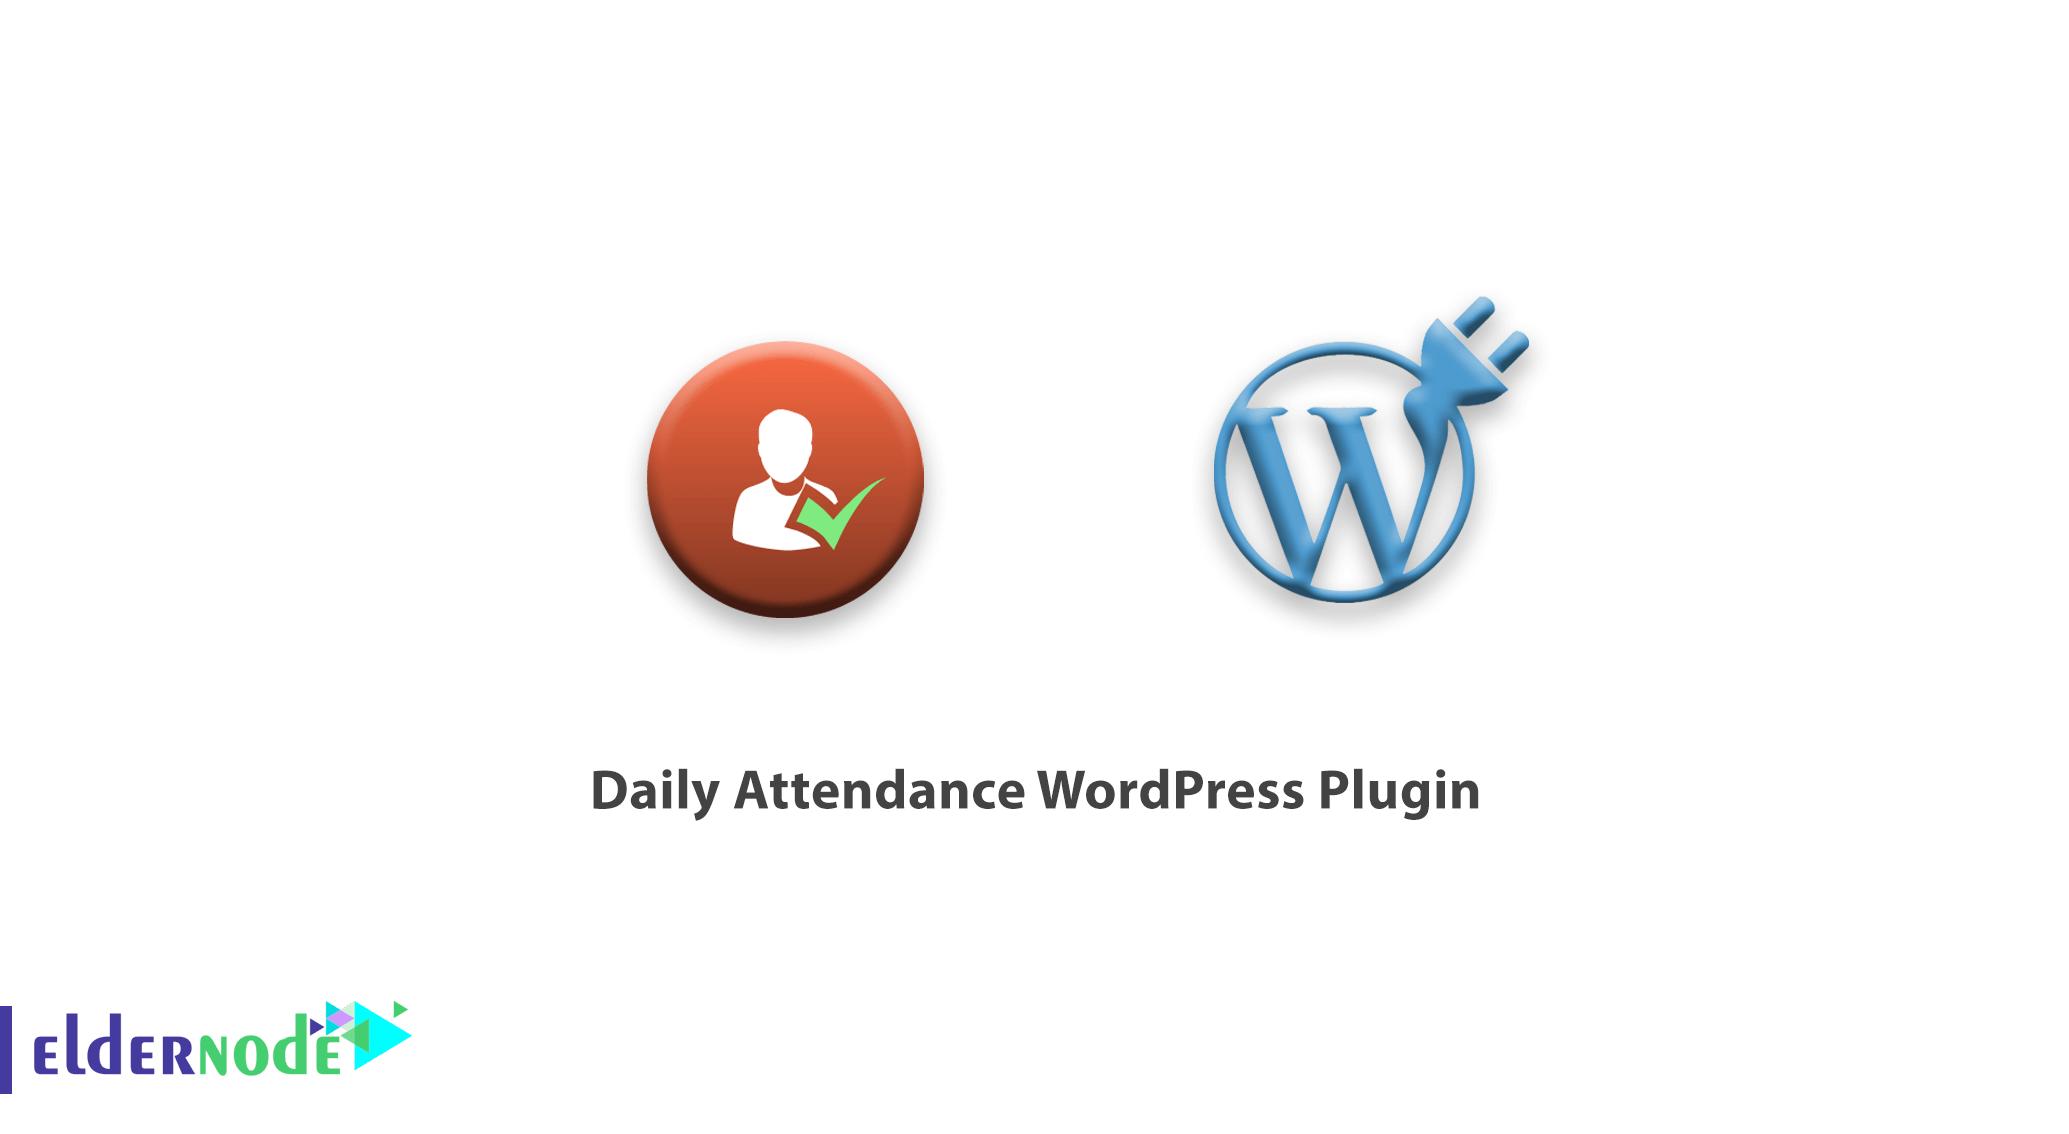 Daily Attendance WordPress Plugin